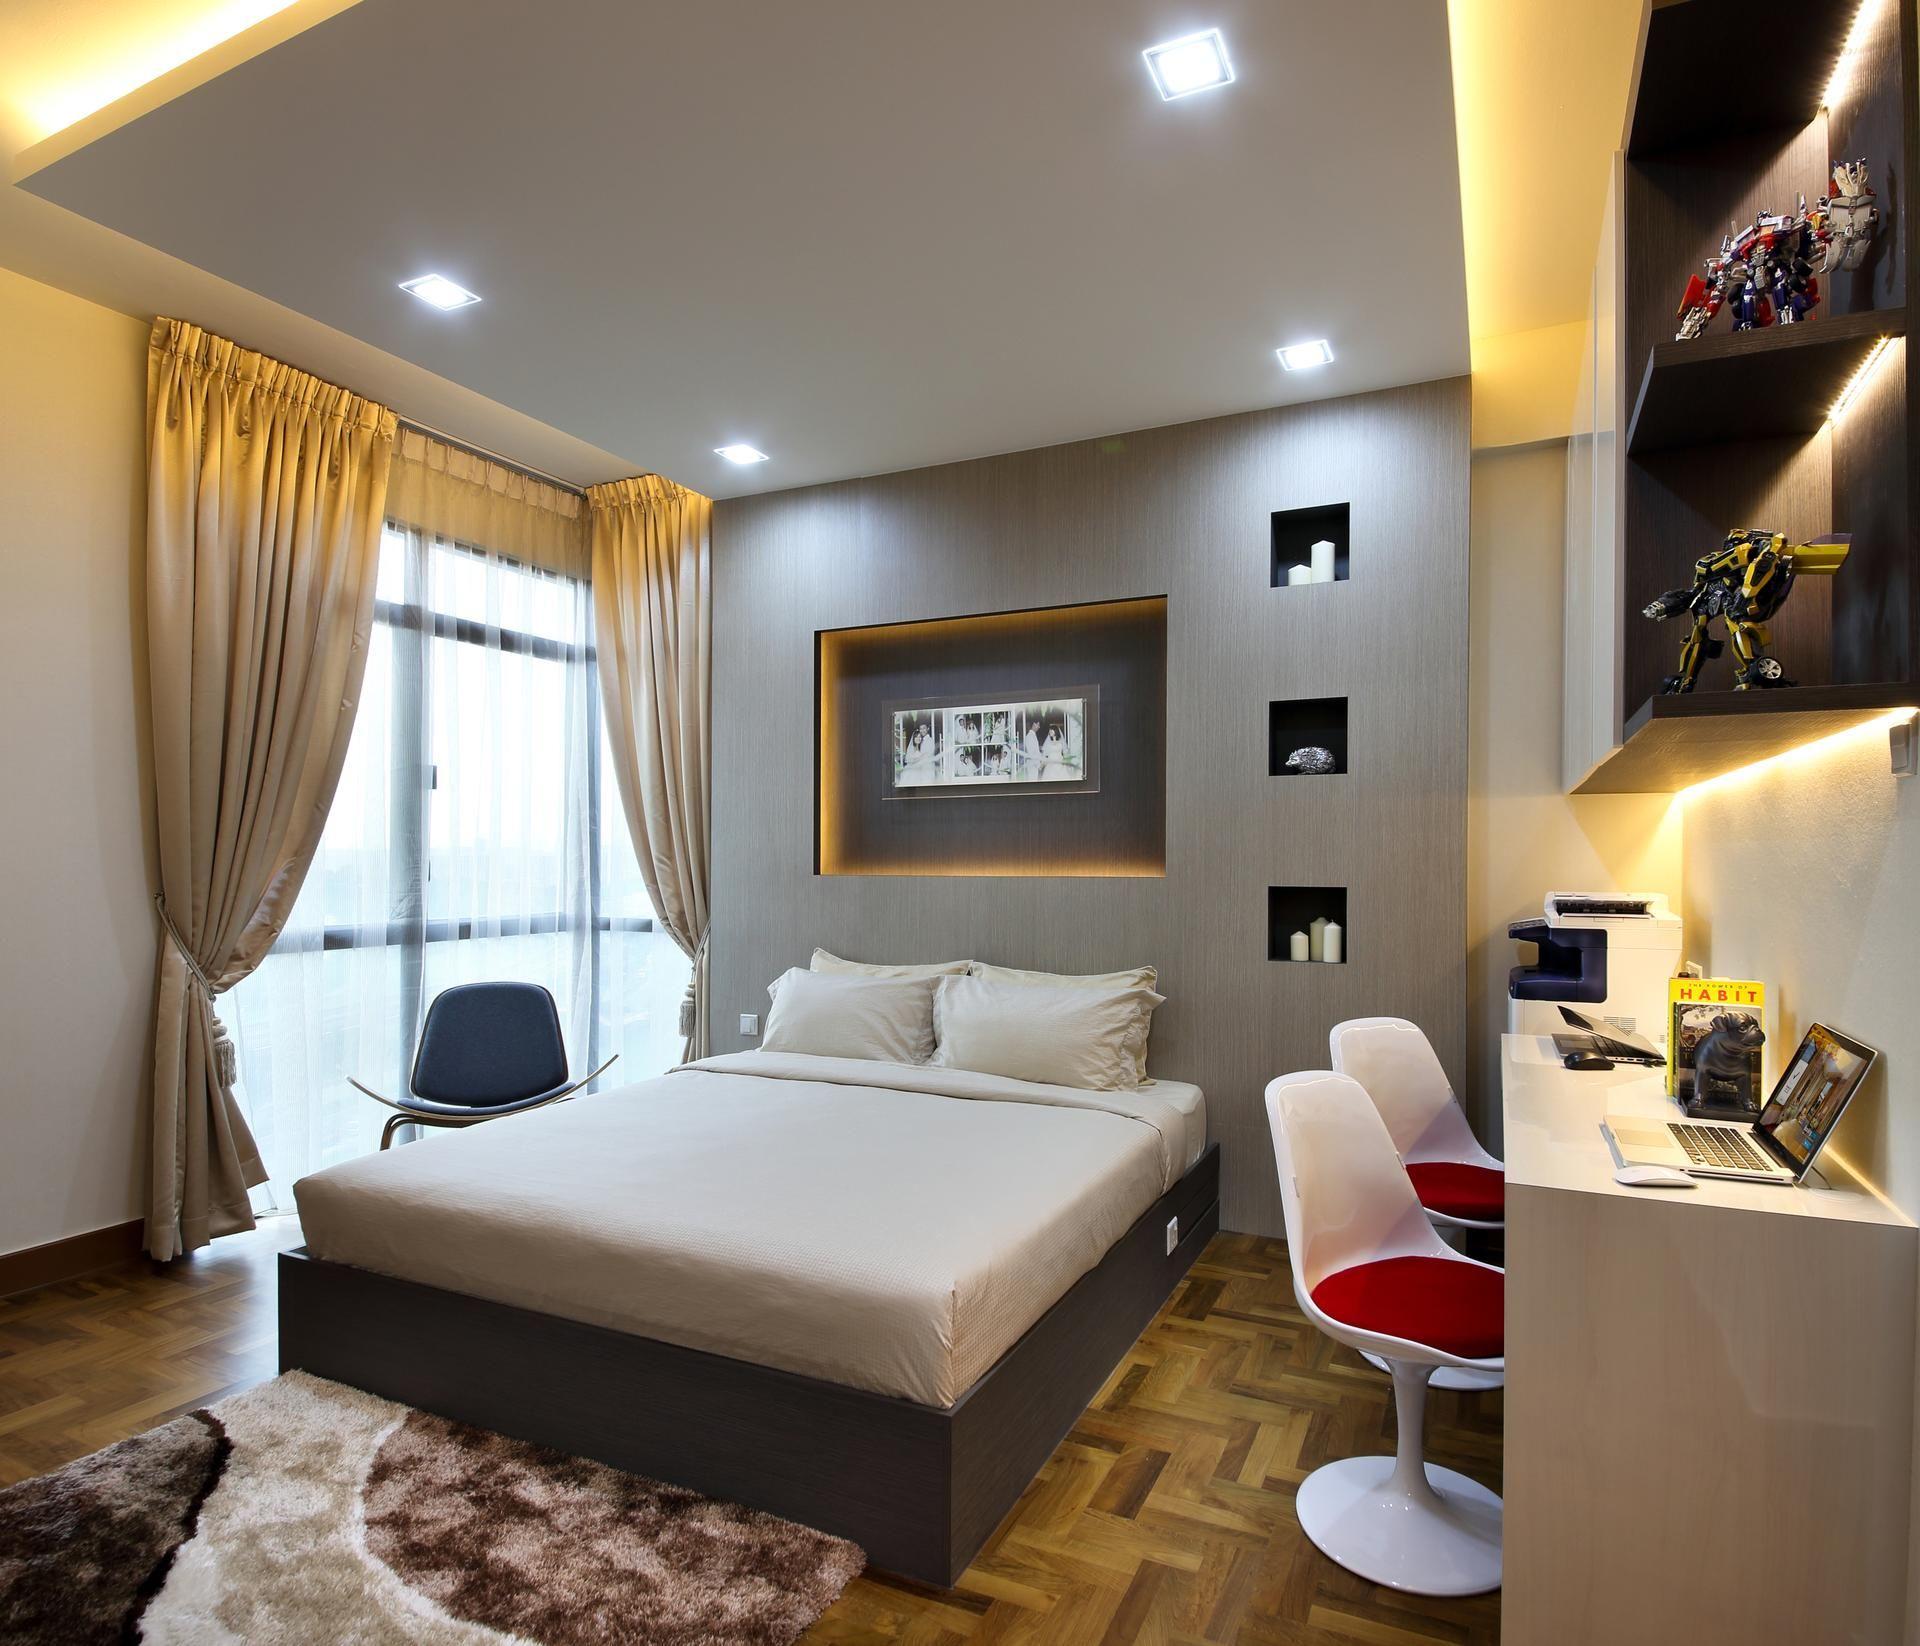 Interior designer wee studio location tampines hdb cost of renovation - Parc Oasis Qanvast Home Design Renovation Remodelling Furnishing Ideas